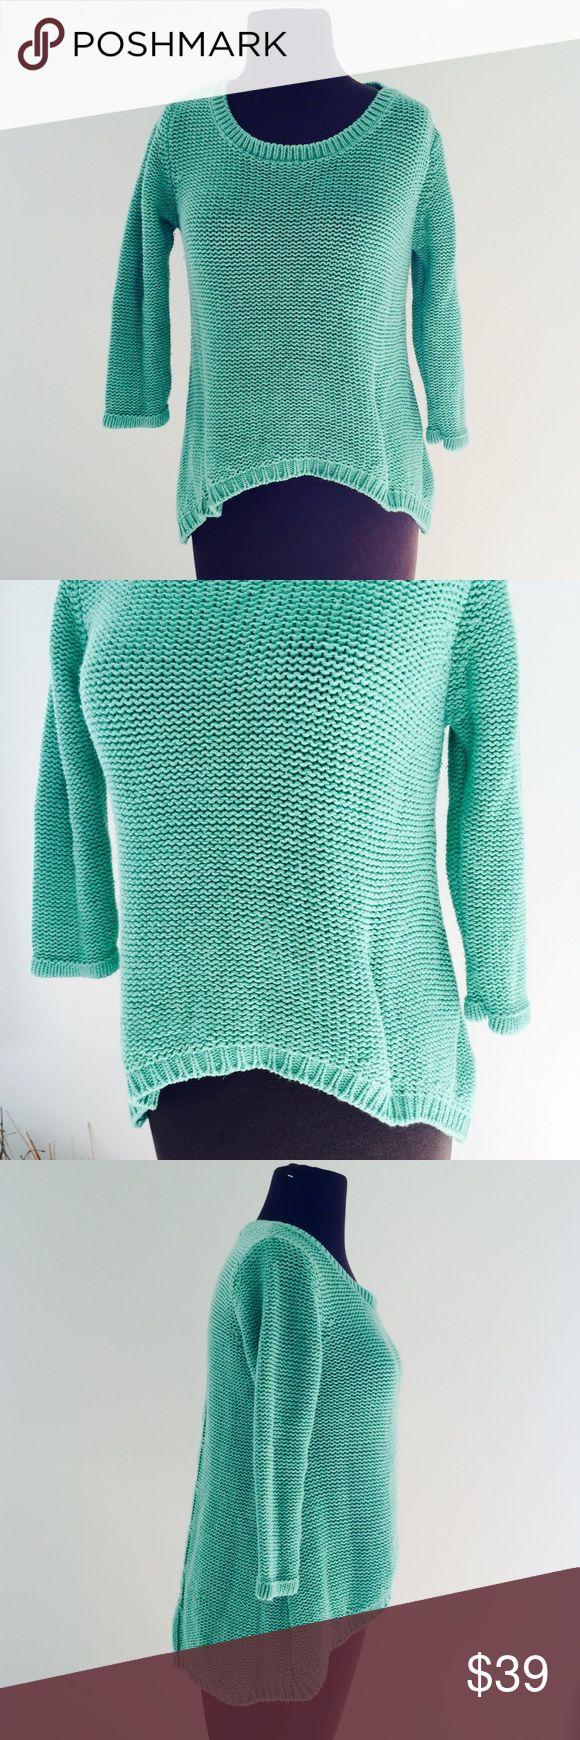 ❗️Zara Knit Hi-Lo Mint Sweater ❗️Zara Knit Hi-Lo Mint Sweater. In great condition size medium. Make an offer! I consider all reasonable offers on items & give great bundle deals! Winter cleanout sale ;-) Zara Sweaters